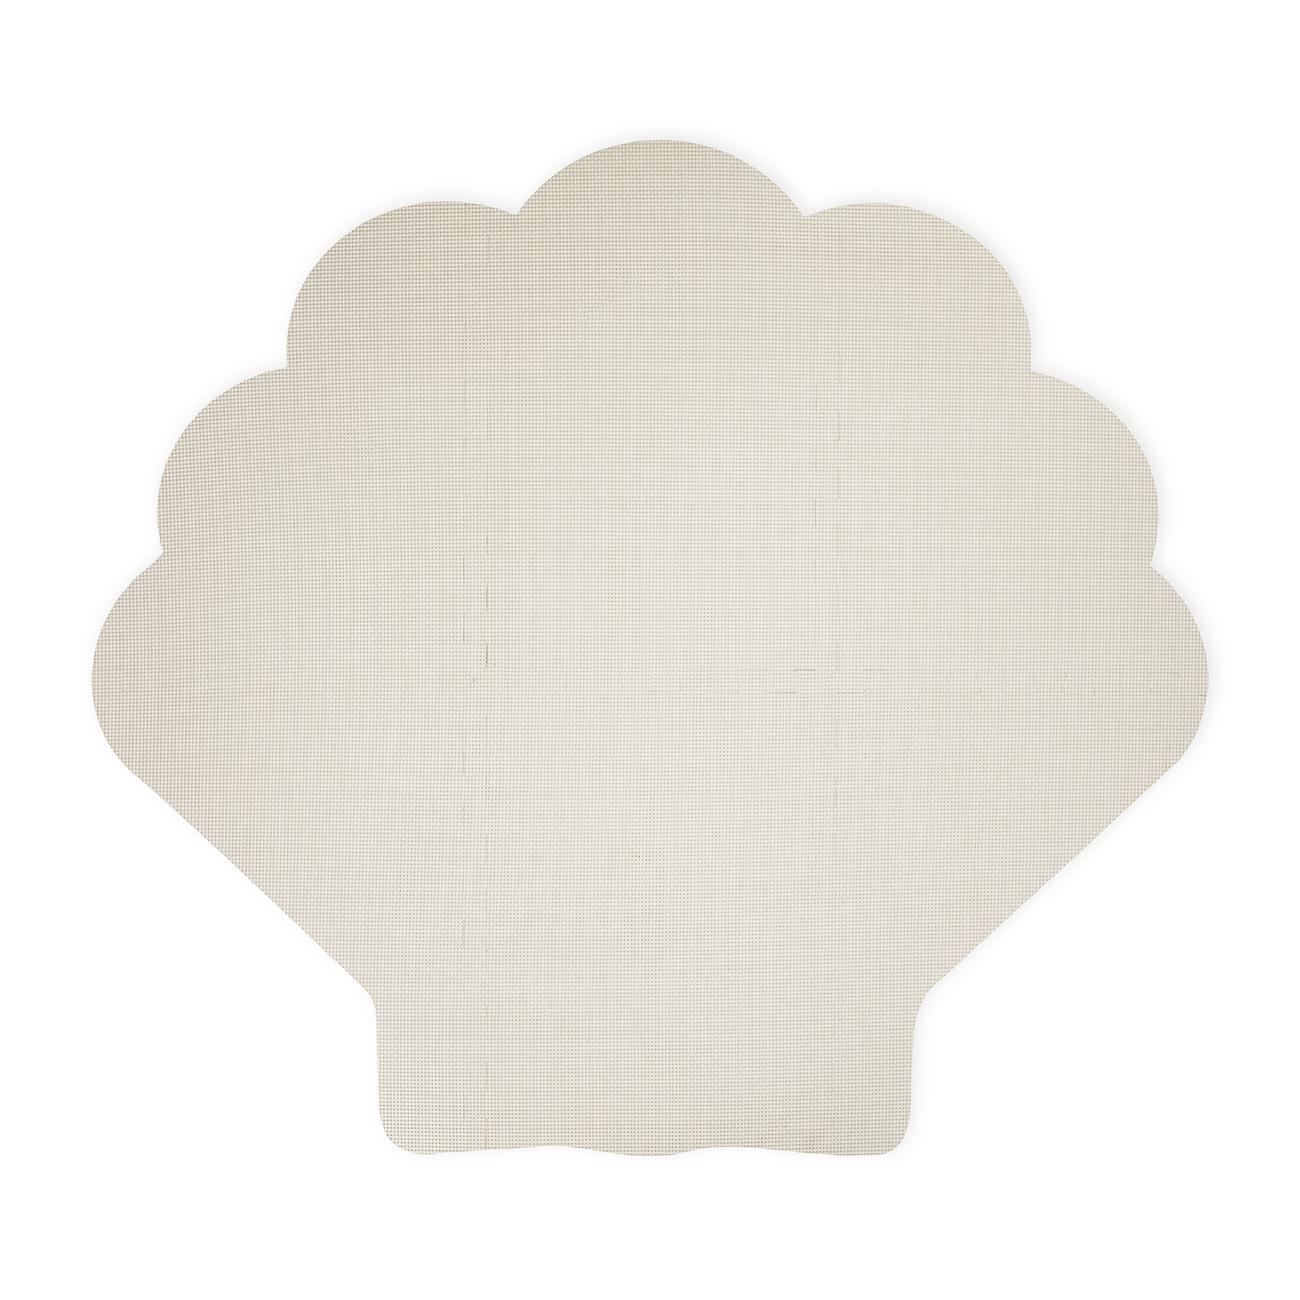 That's Mine - Foam Play Mat Shell - Light Grey (PM2111)